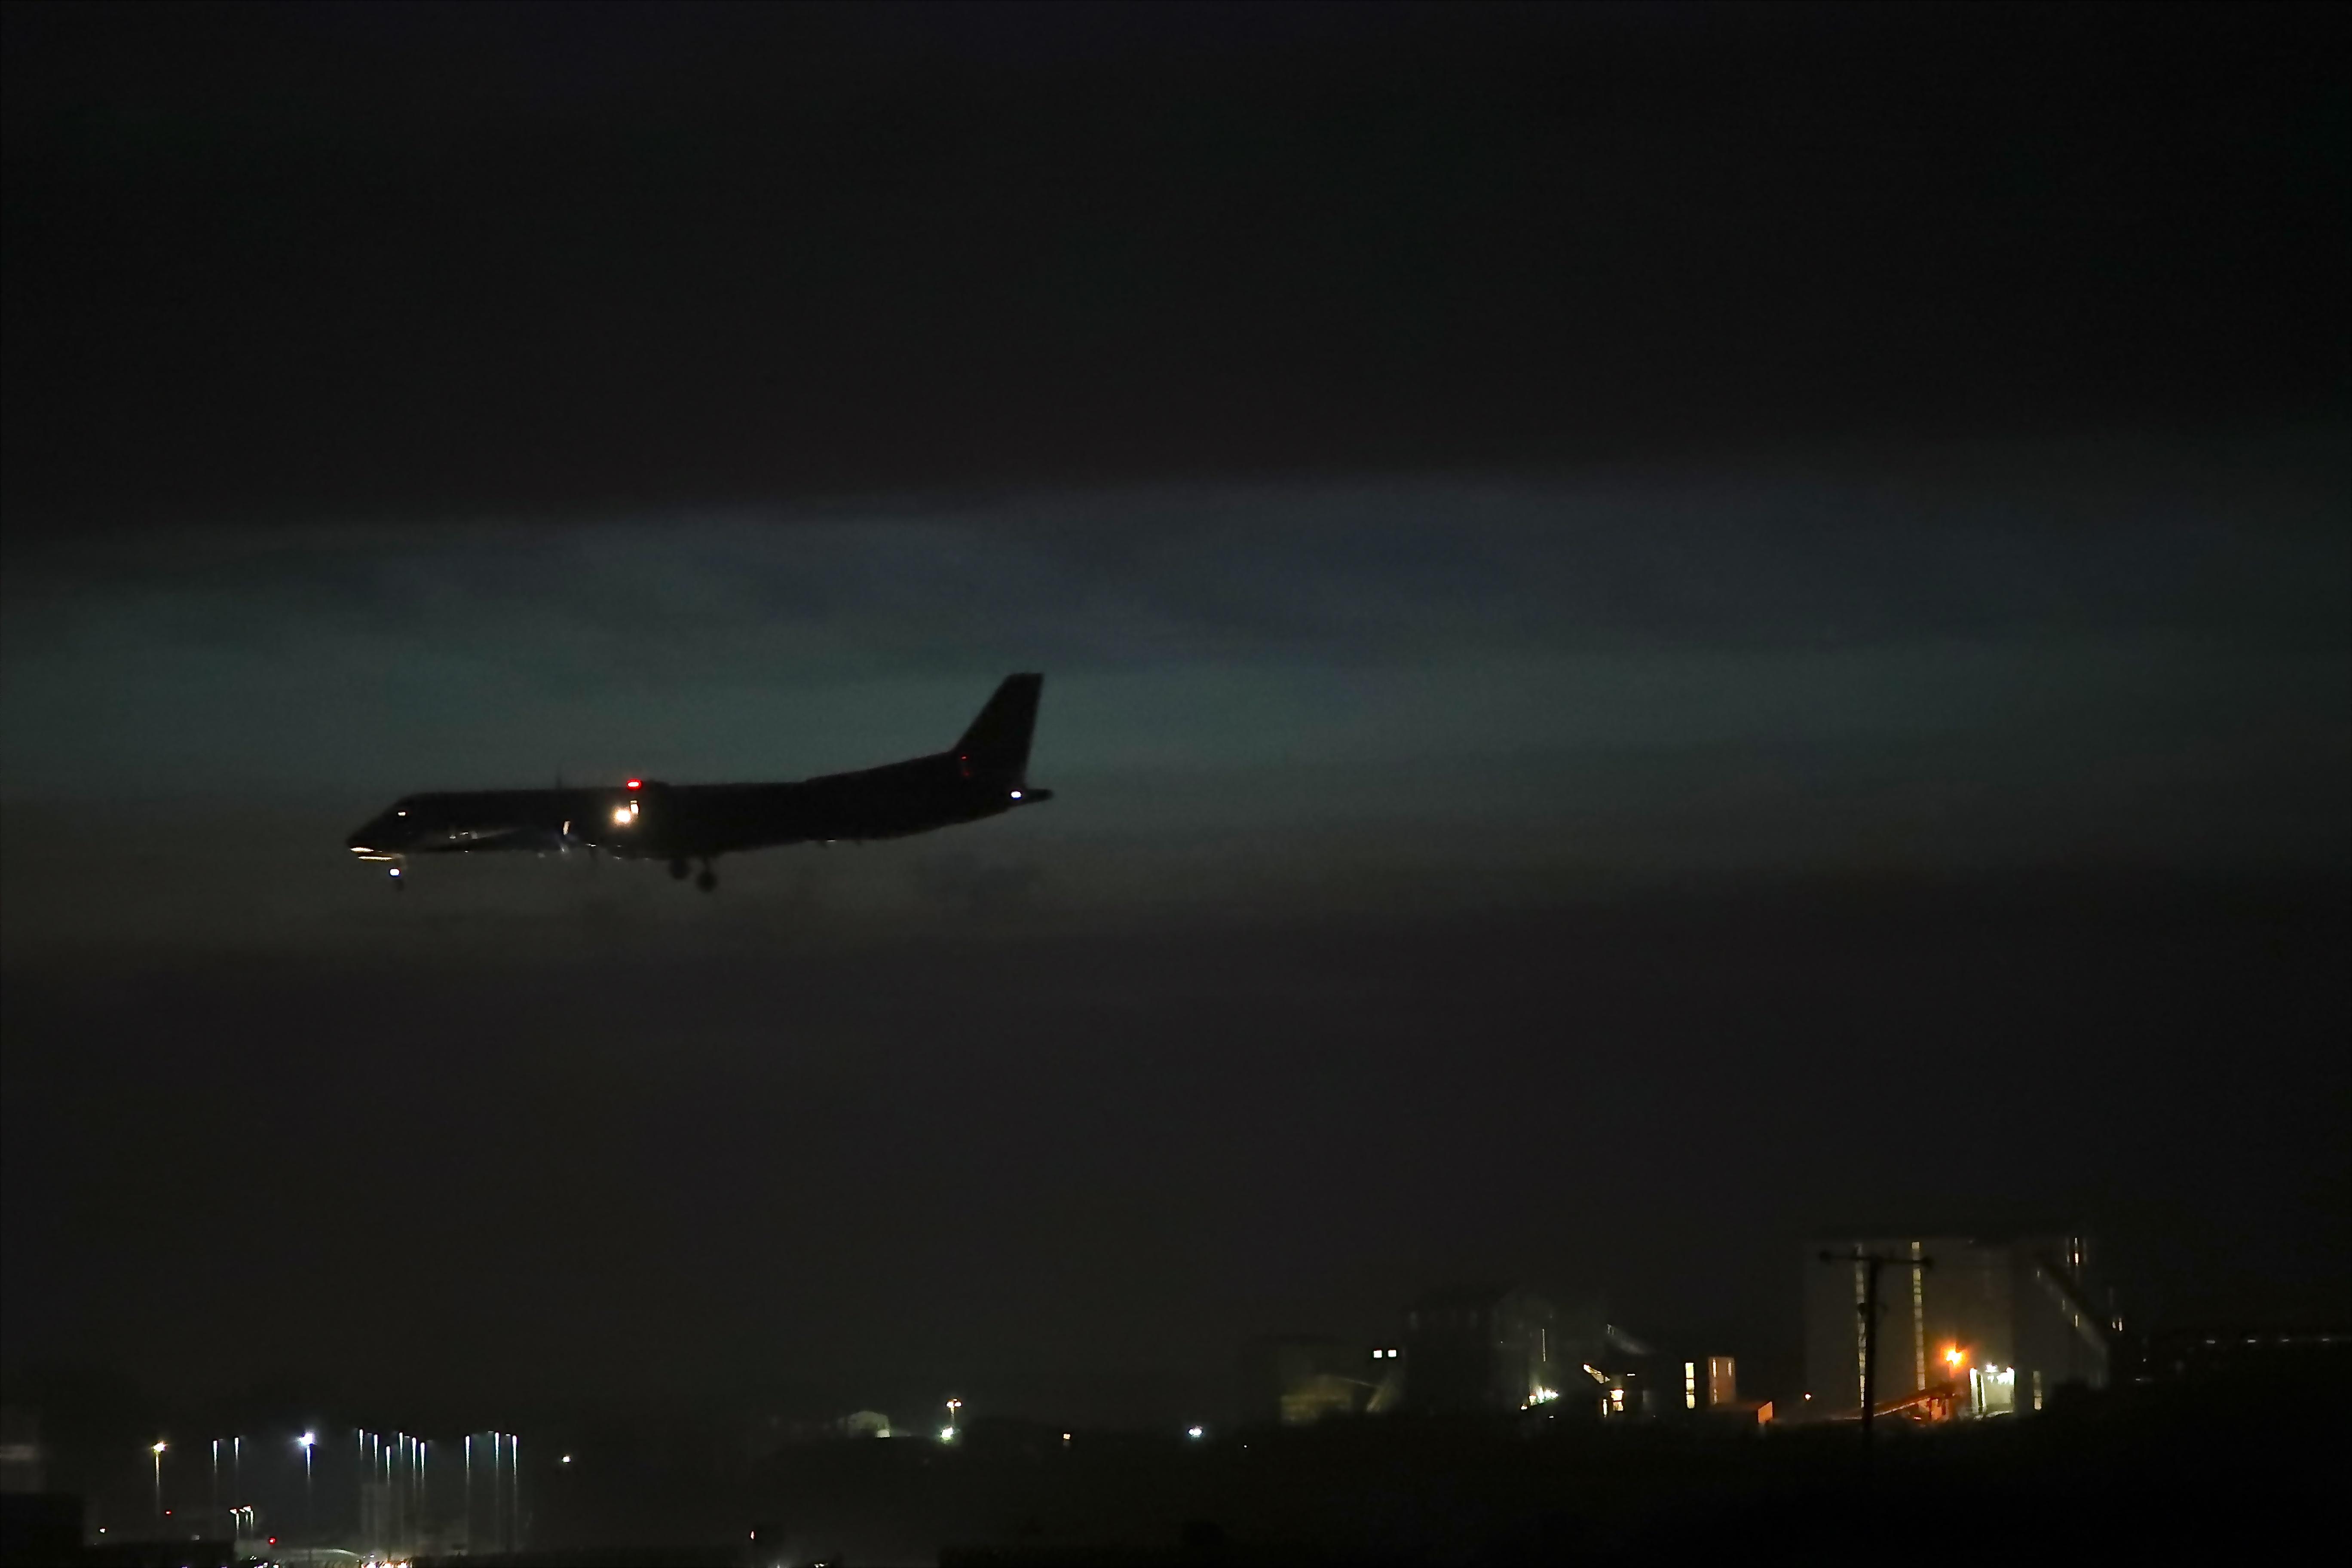 Good Wallpaper Night Airplane - night-sky-airplane-aircraft-evening-atmosphere-airport-dusk-landing-saab-runway-Flight-aviation-darkness-wing-daytime-nightshot-airline-atmosphere-of-earth-air-travel-aerospace-engineering-airliner-narrow-body-aircraft-phenomenon-humberside-liner-831335  Gallery.jpg